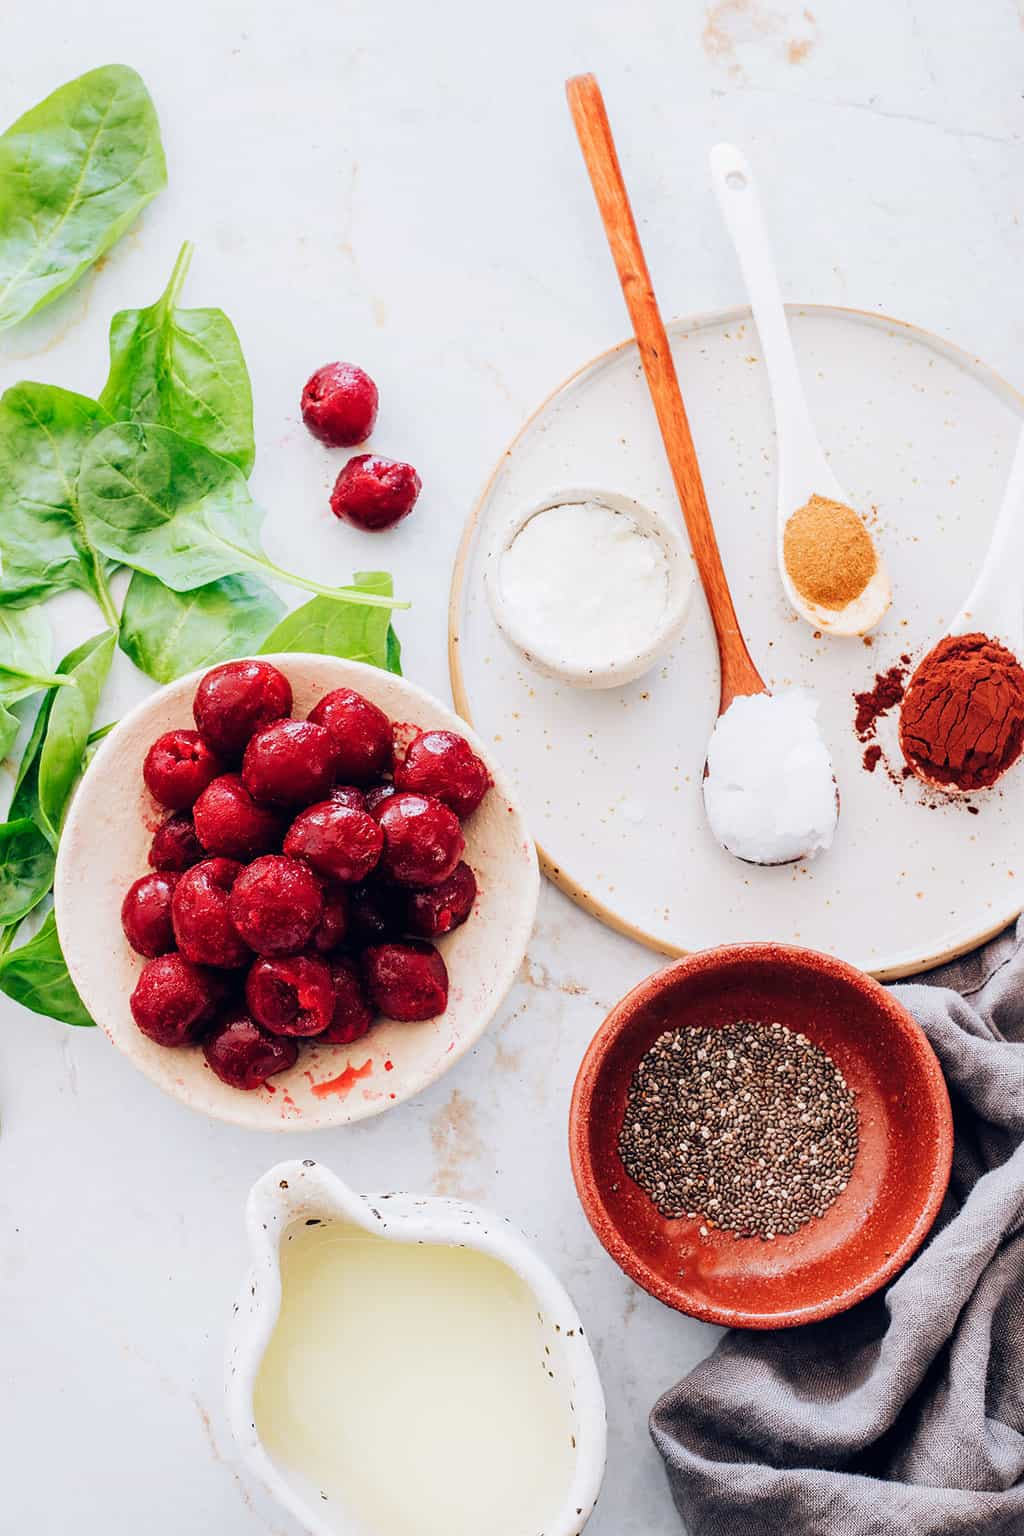 Ingredients for Cherry Collagen Smoothie